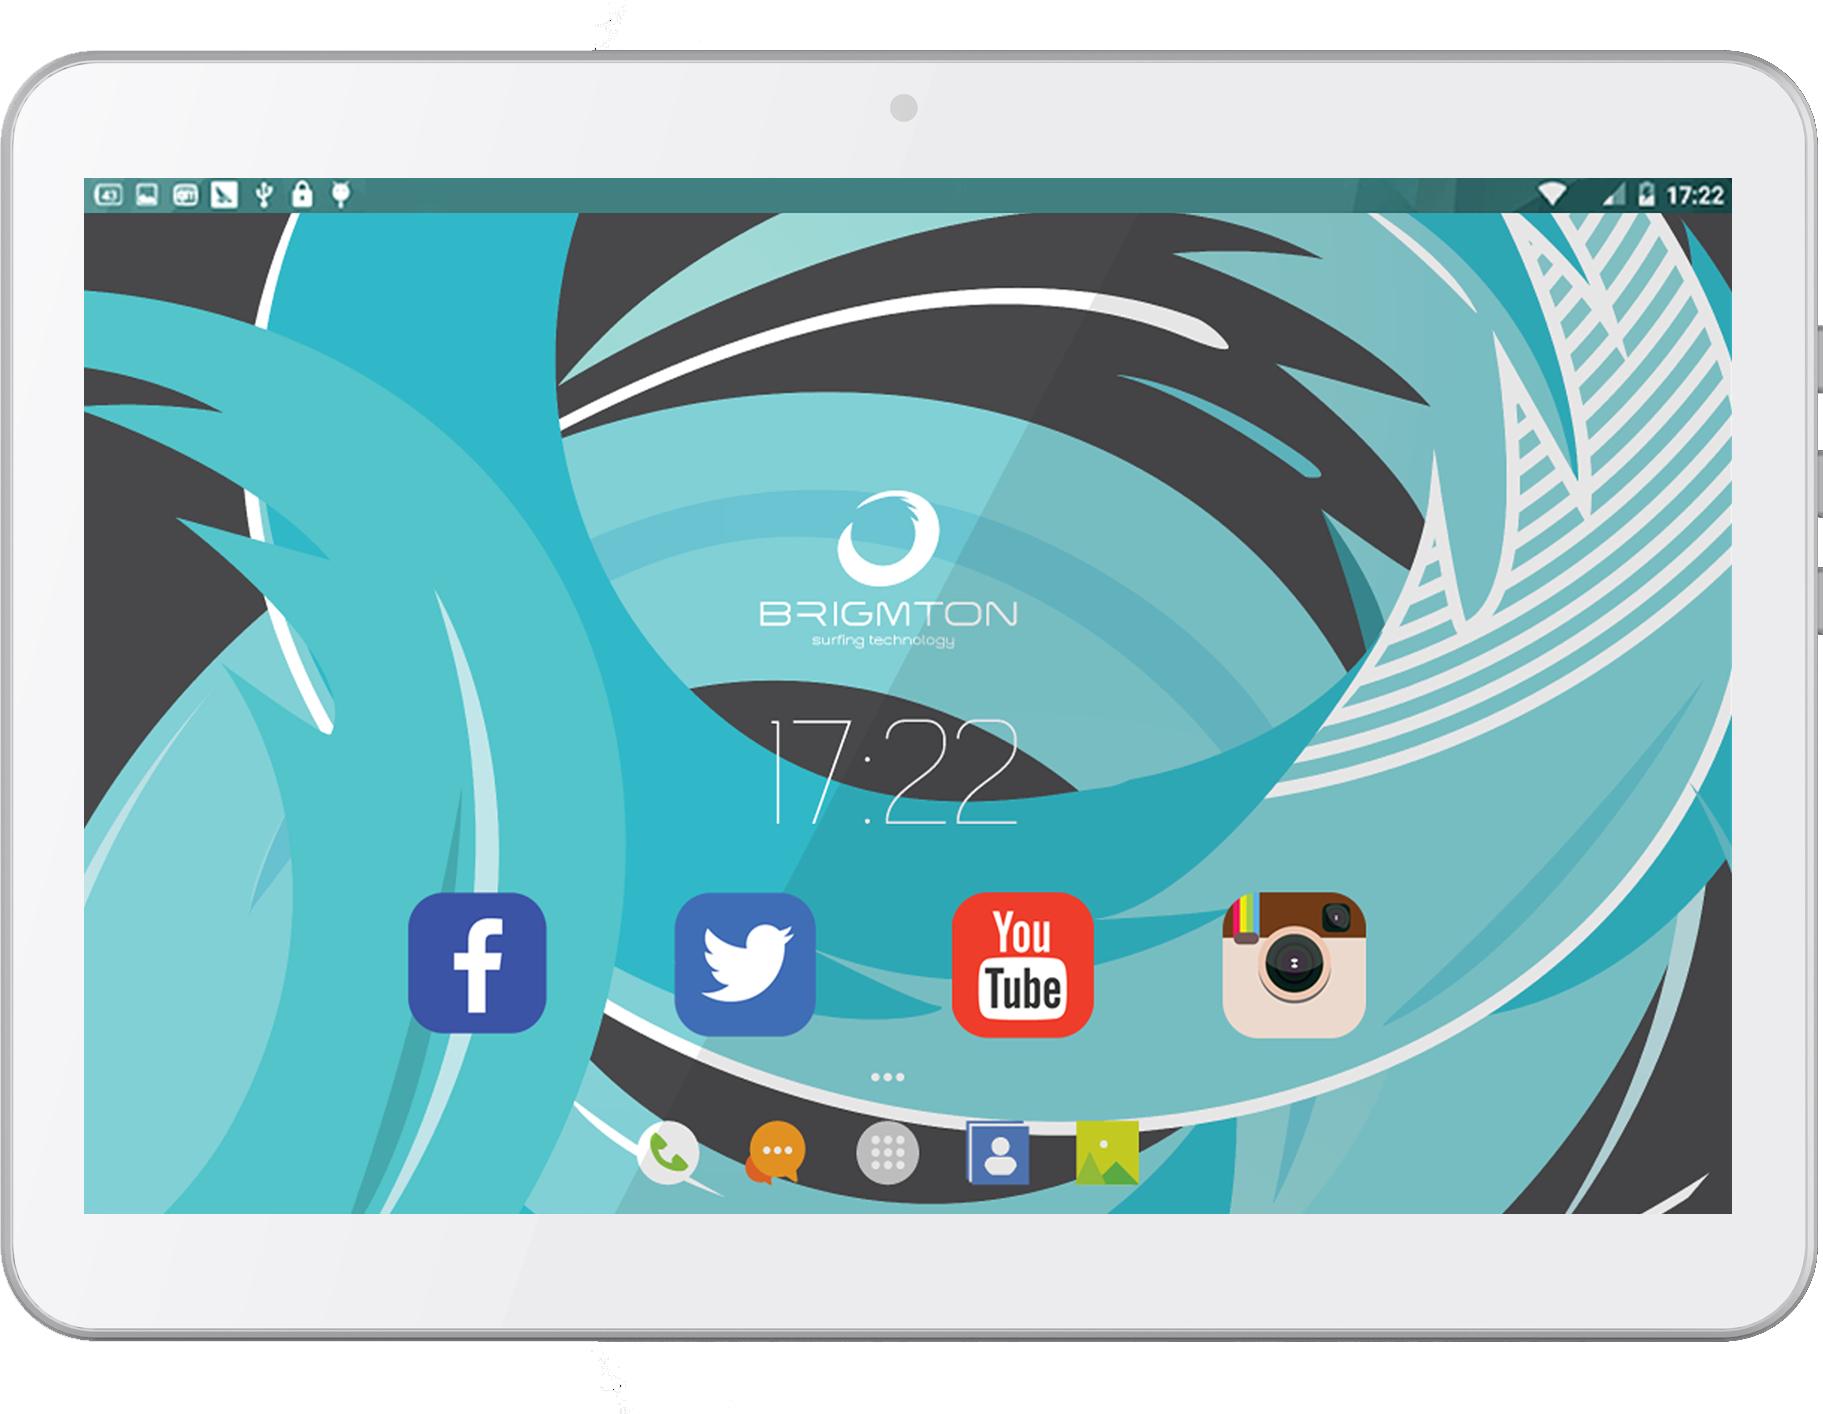 Brigmton BTPC-1021QC3G 16GB 3G Bianco tablet 8425081017006  02_S0402584